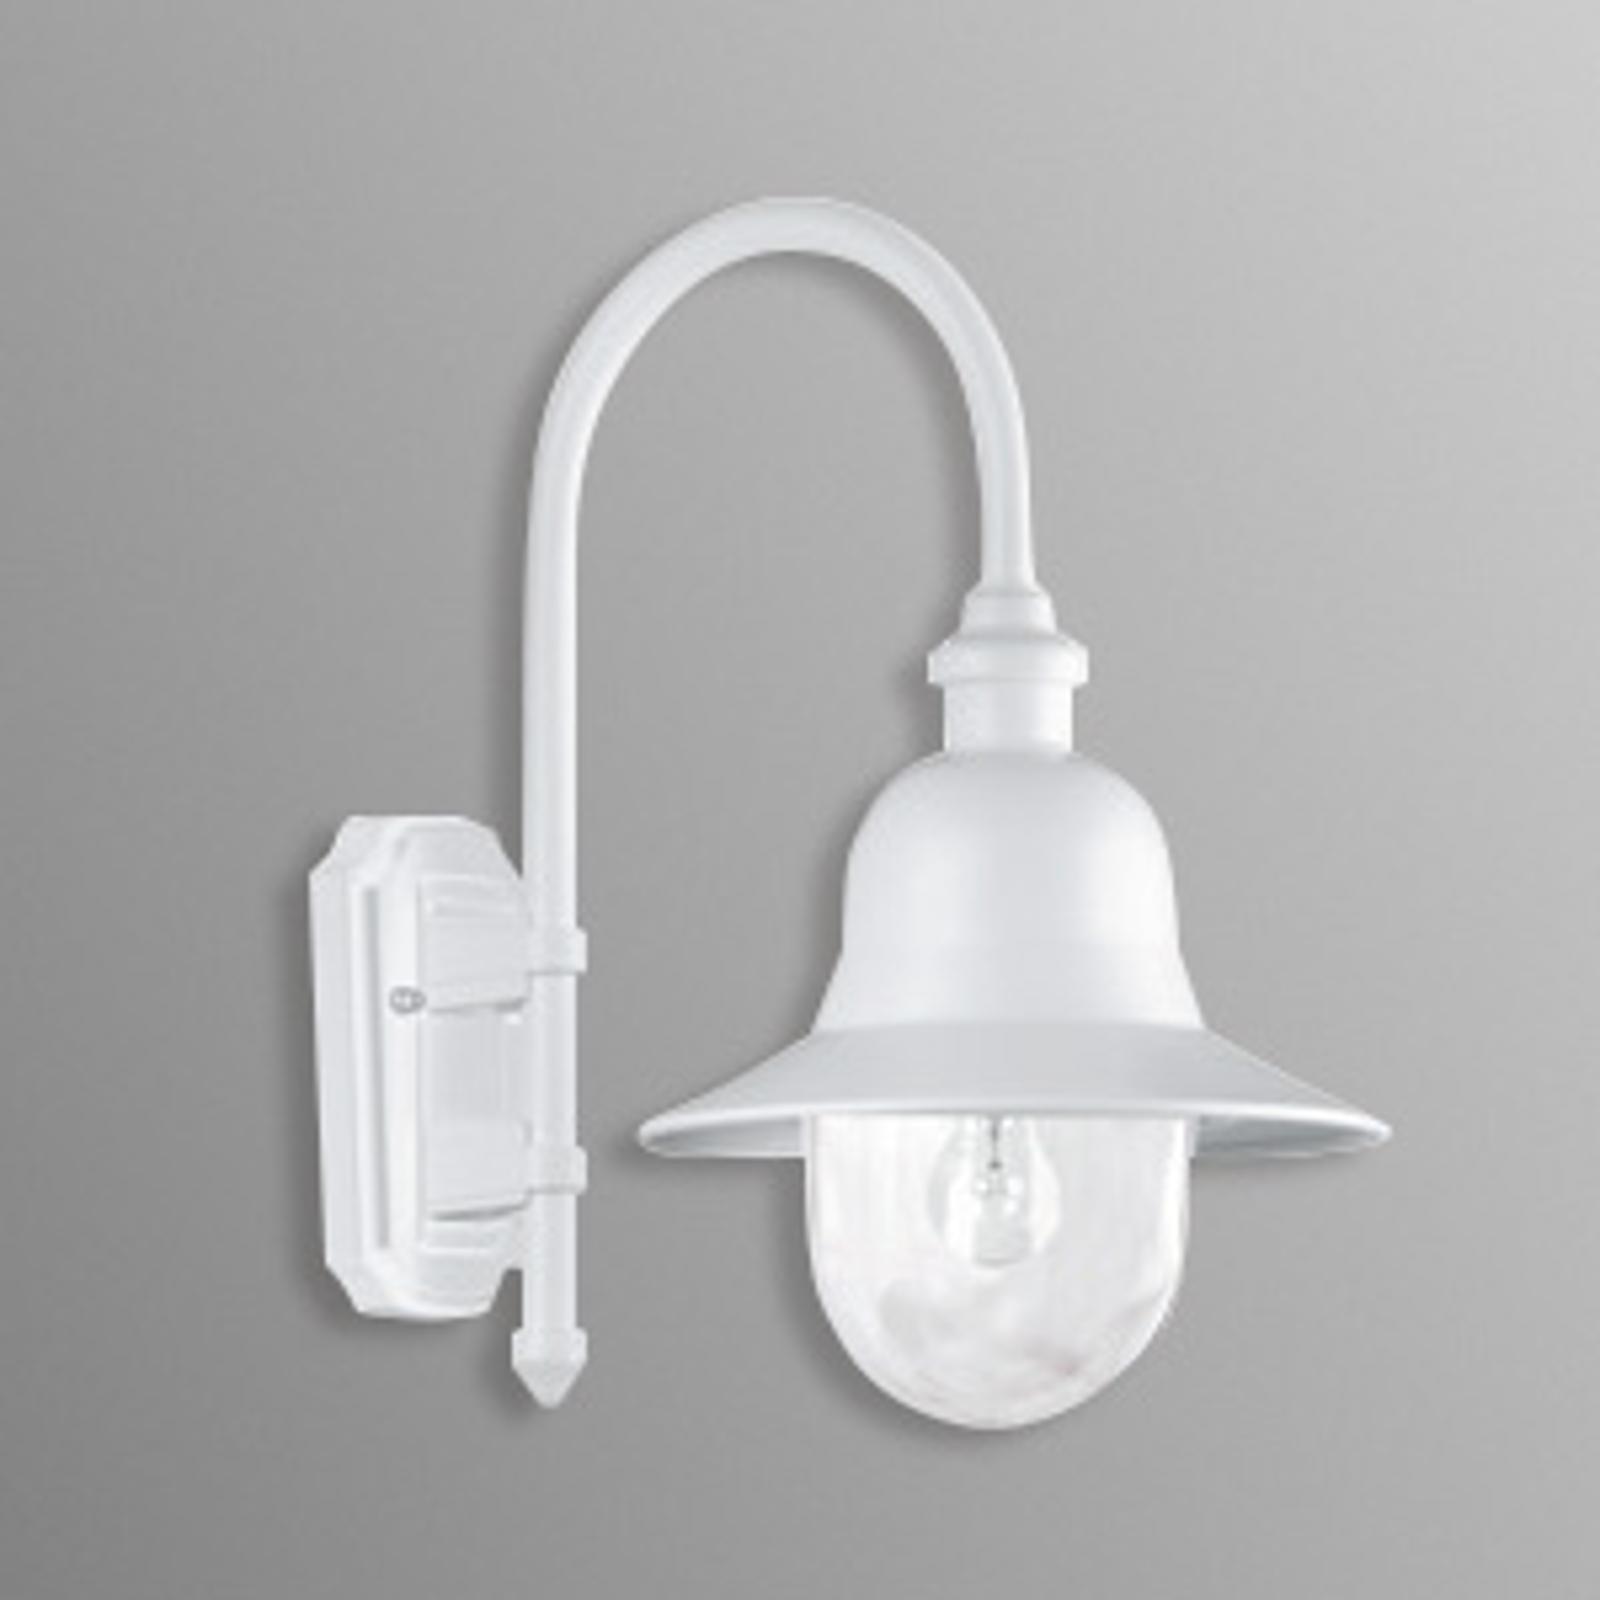 Tijdloos mooie outdoor wandlamp Nios wit